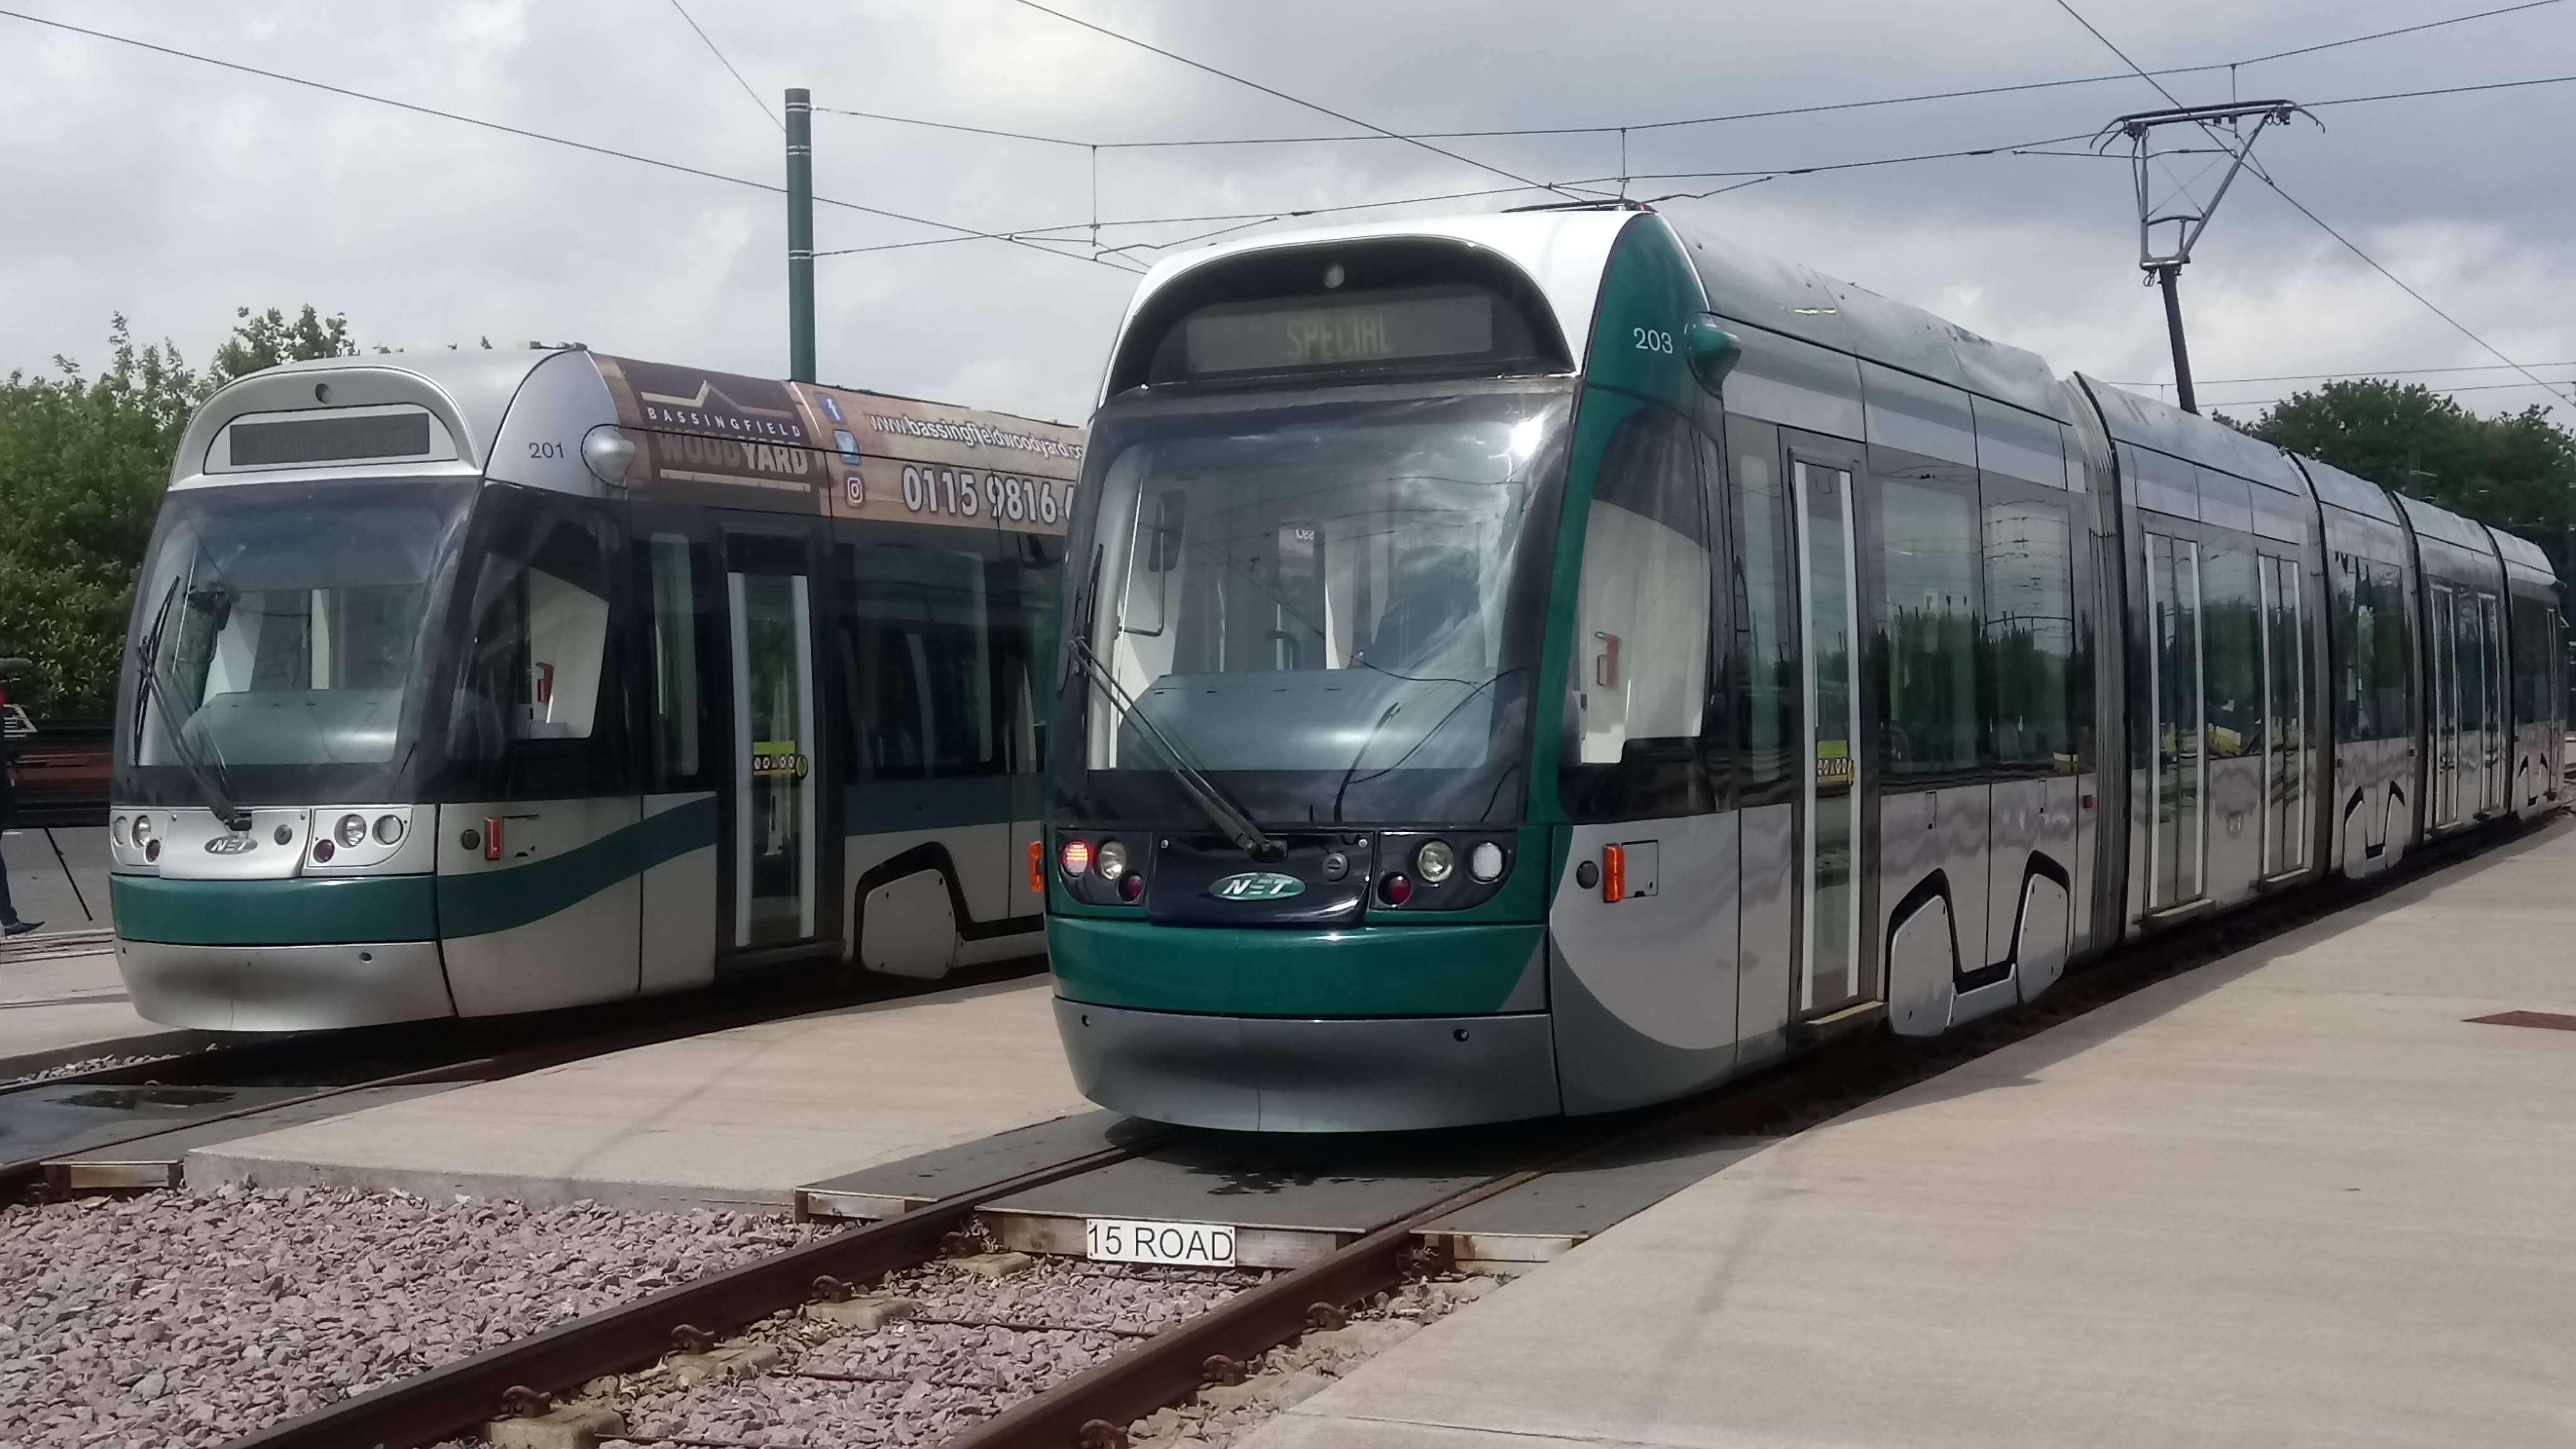 Refurbished tram at the Wilkinson Street tram depot